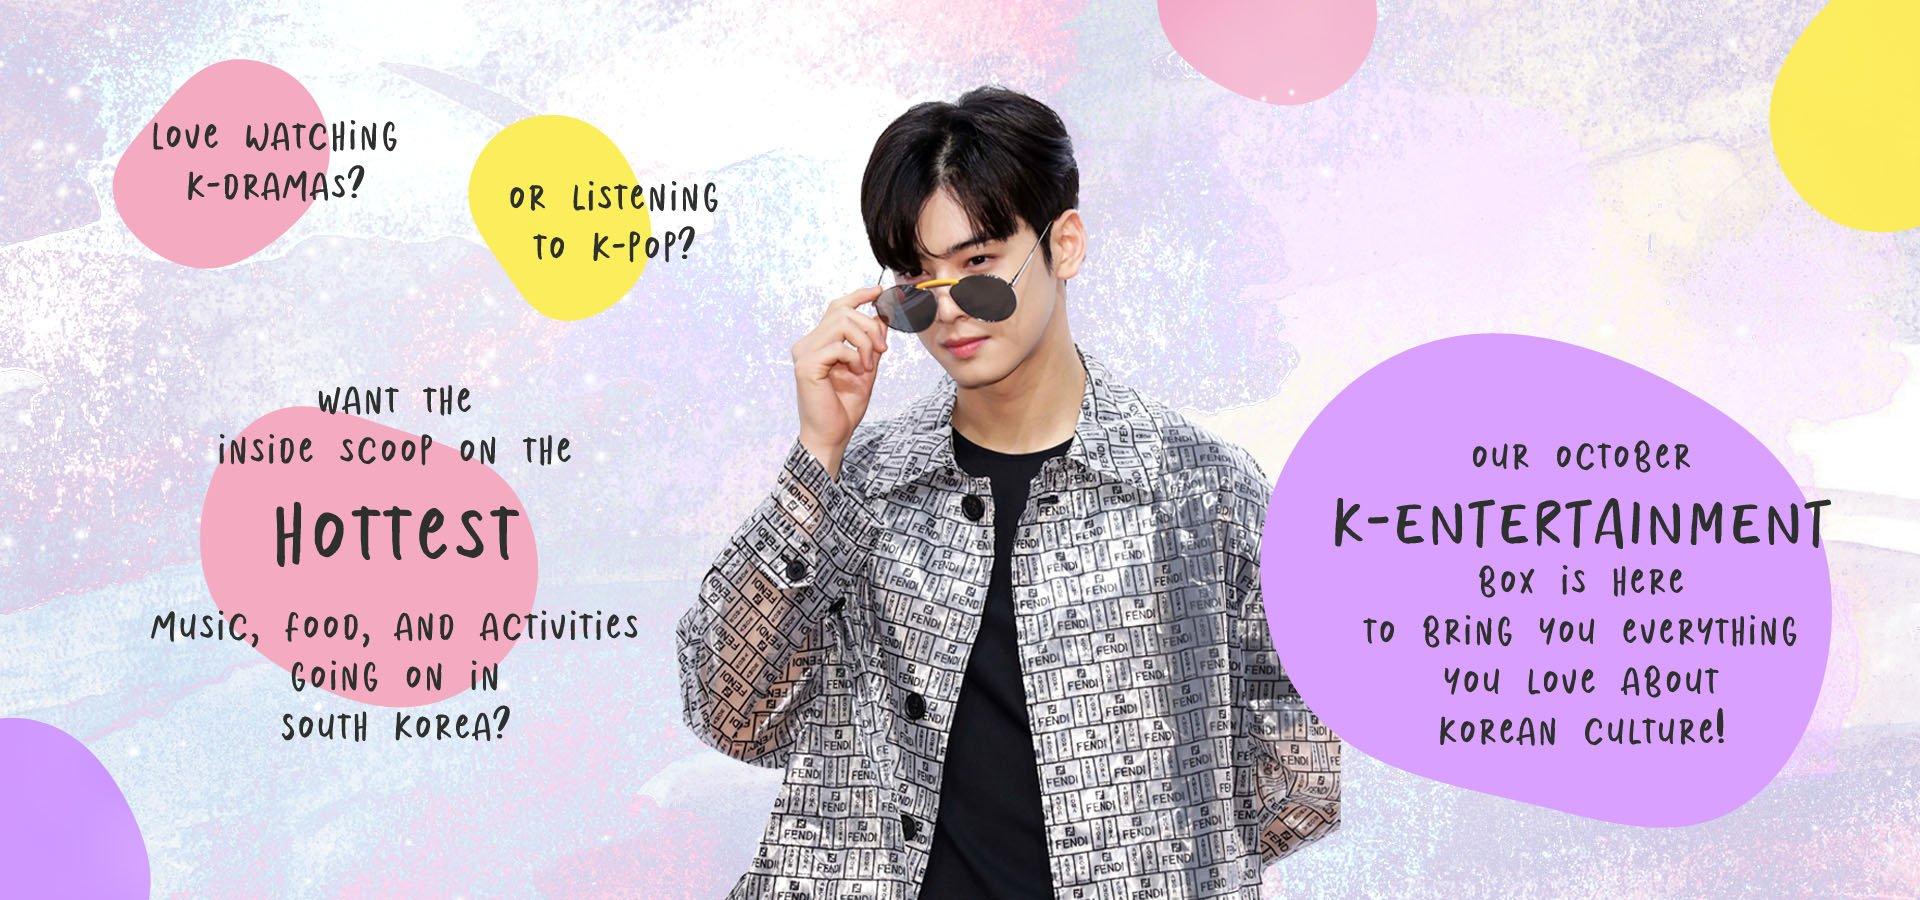 Korean Culture Box | Korean Subscription Box - Inspire Me Korea